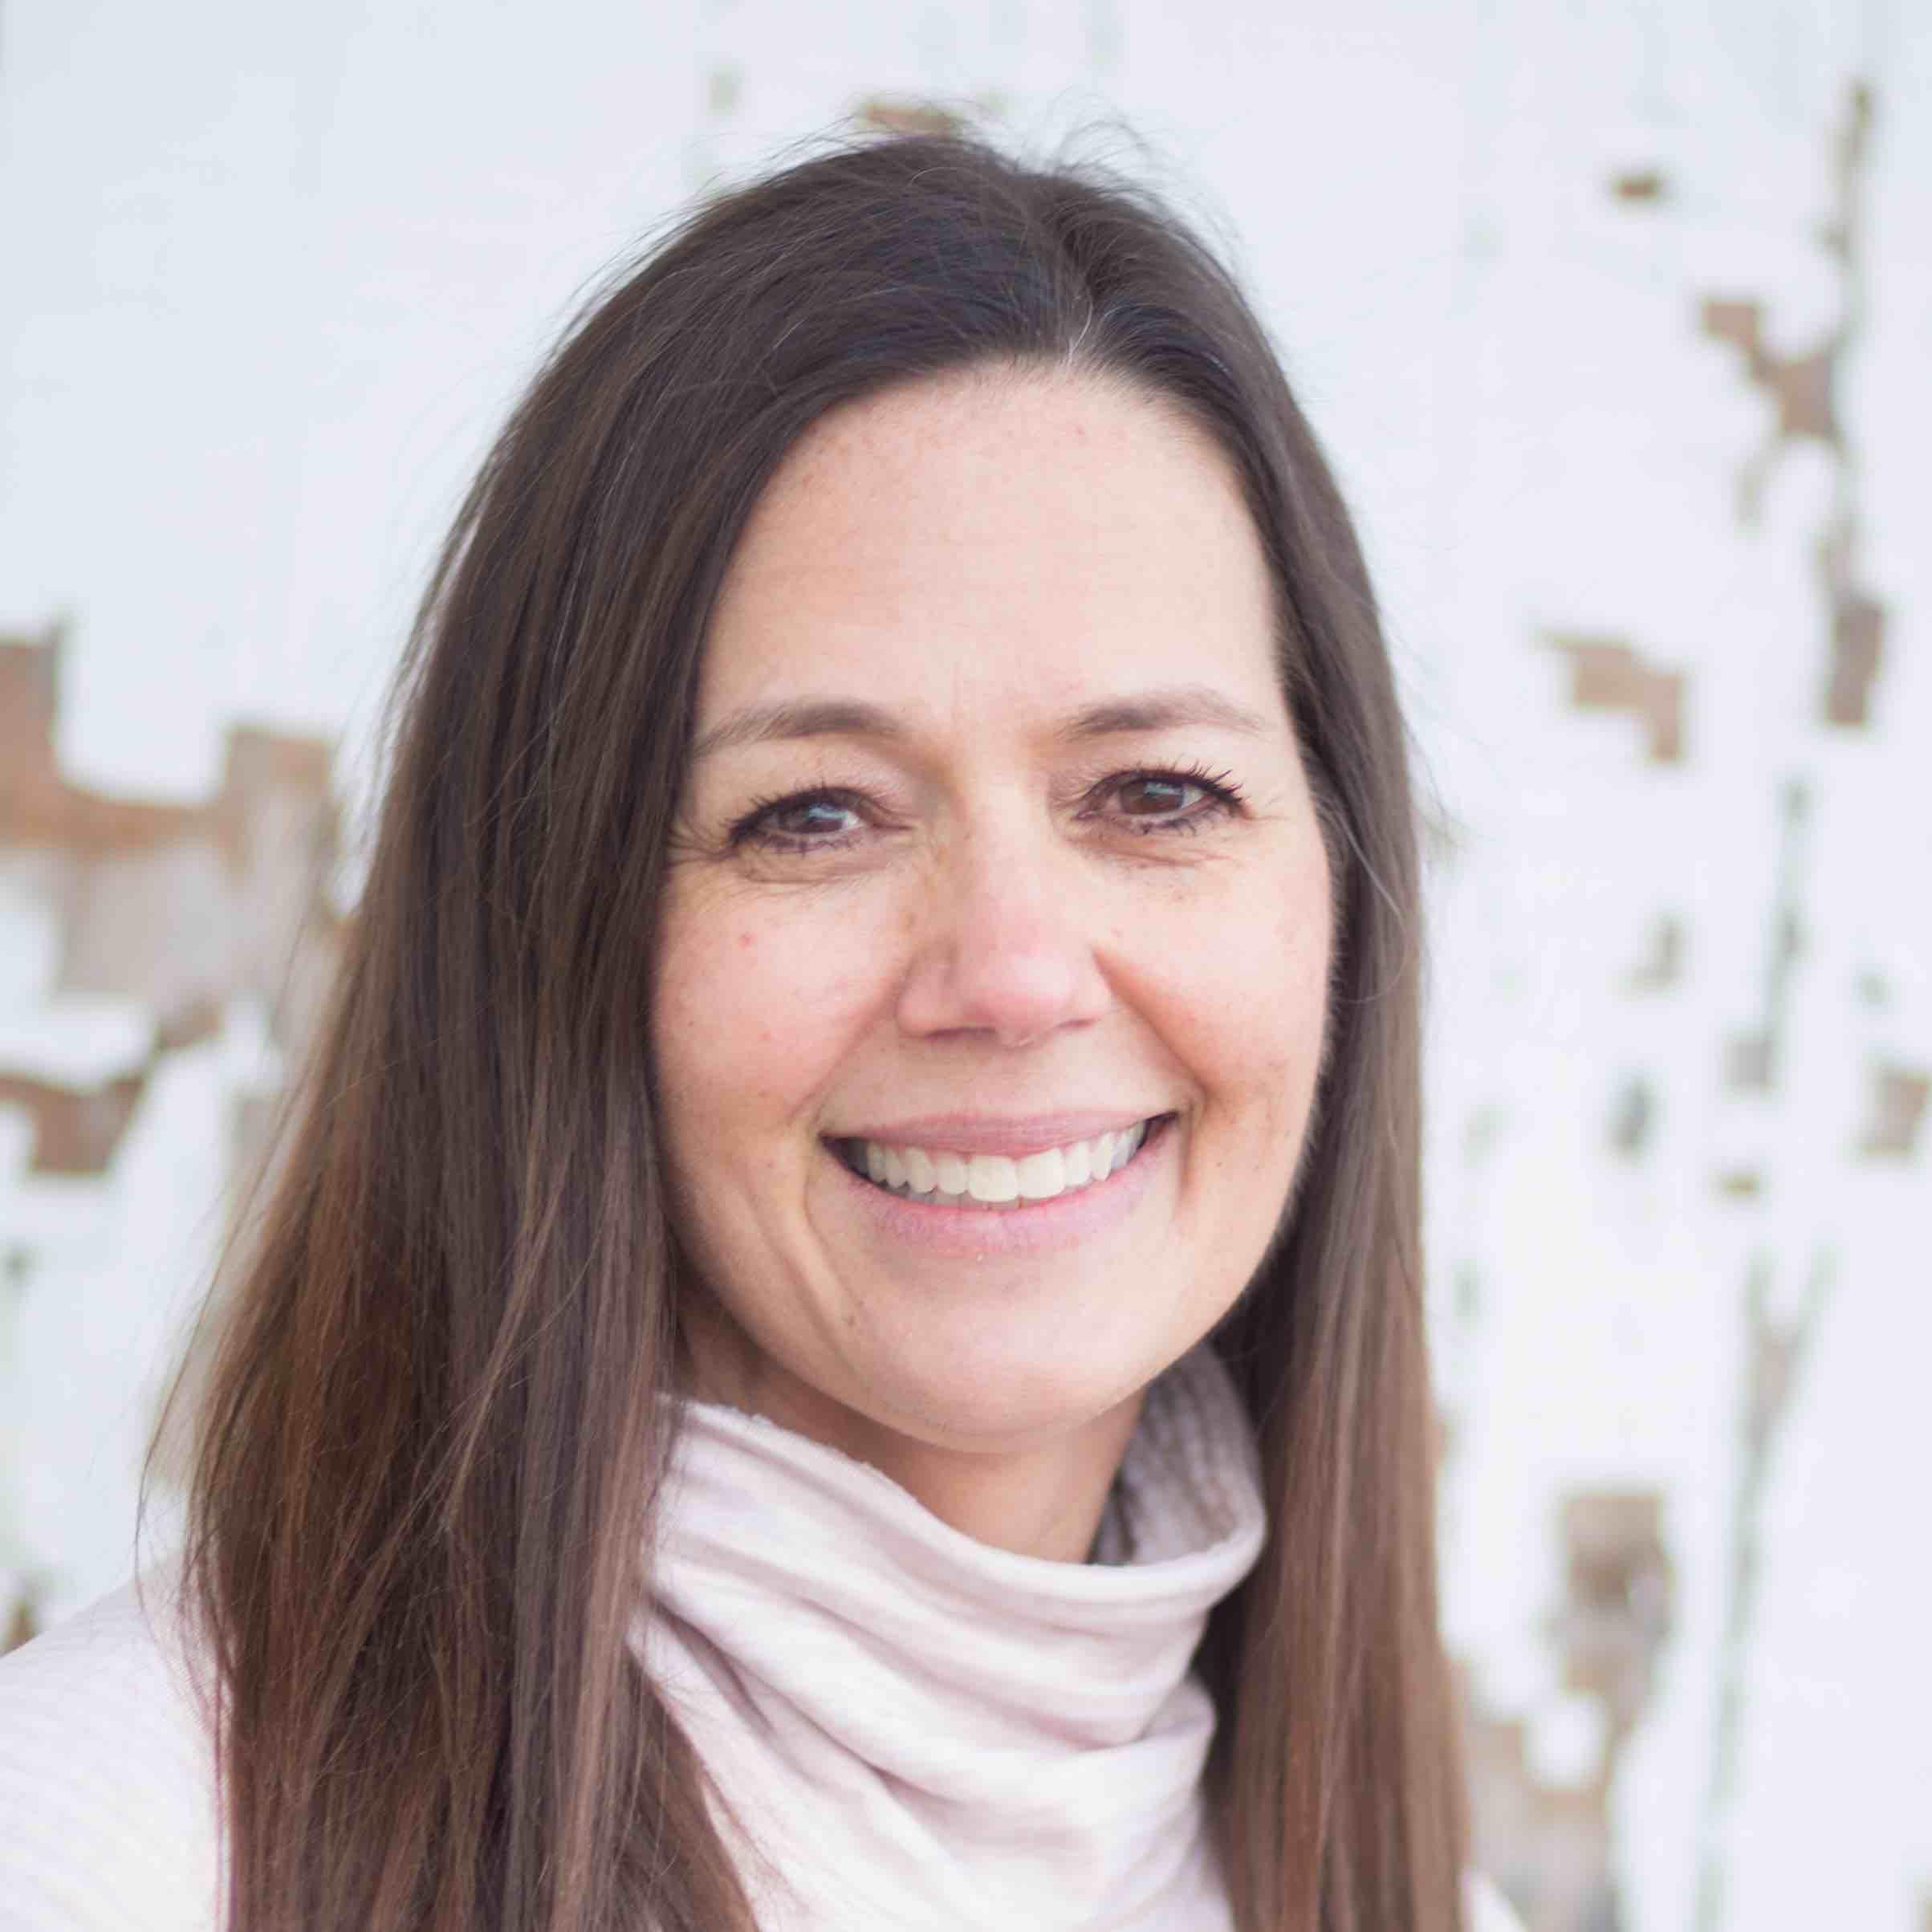 MICHELLE LOCKHART profile image